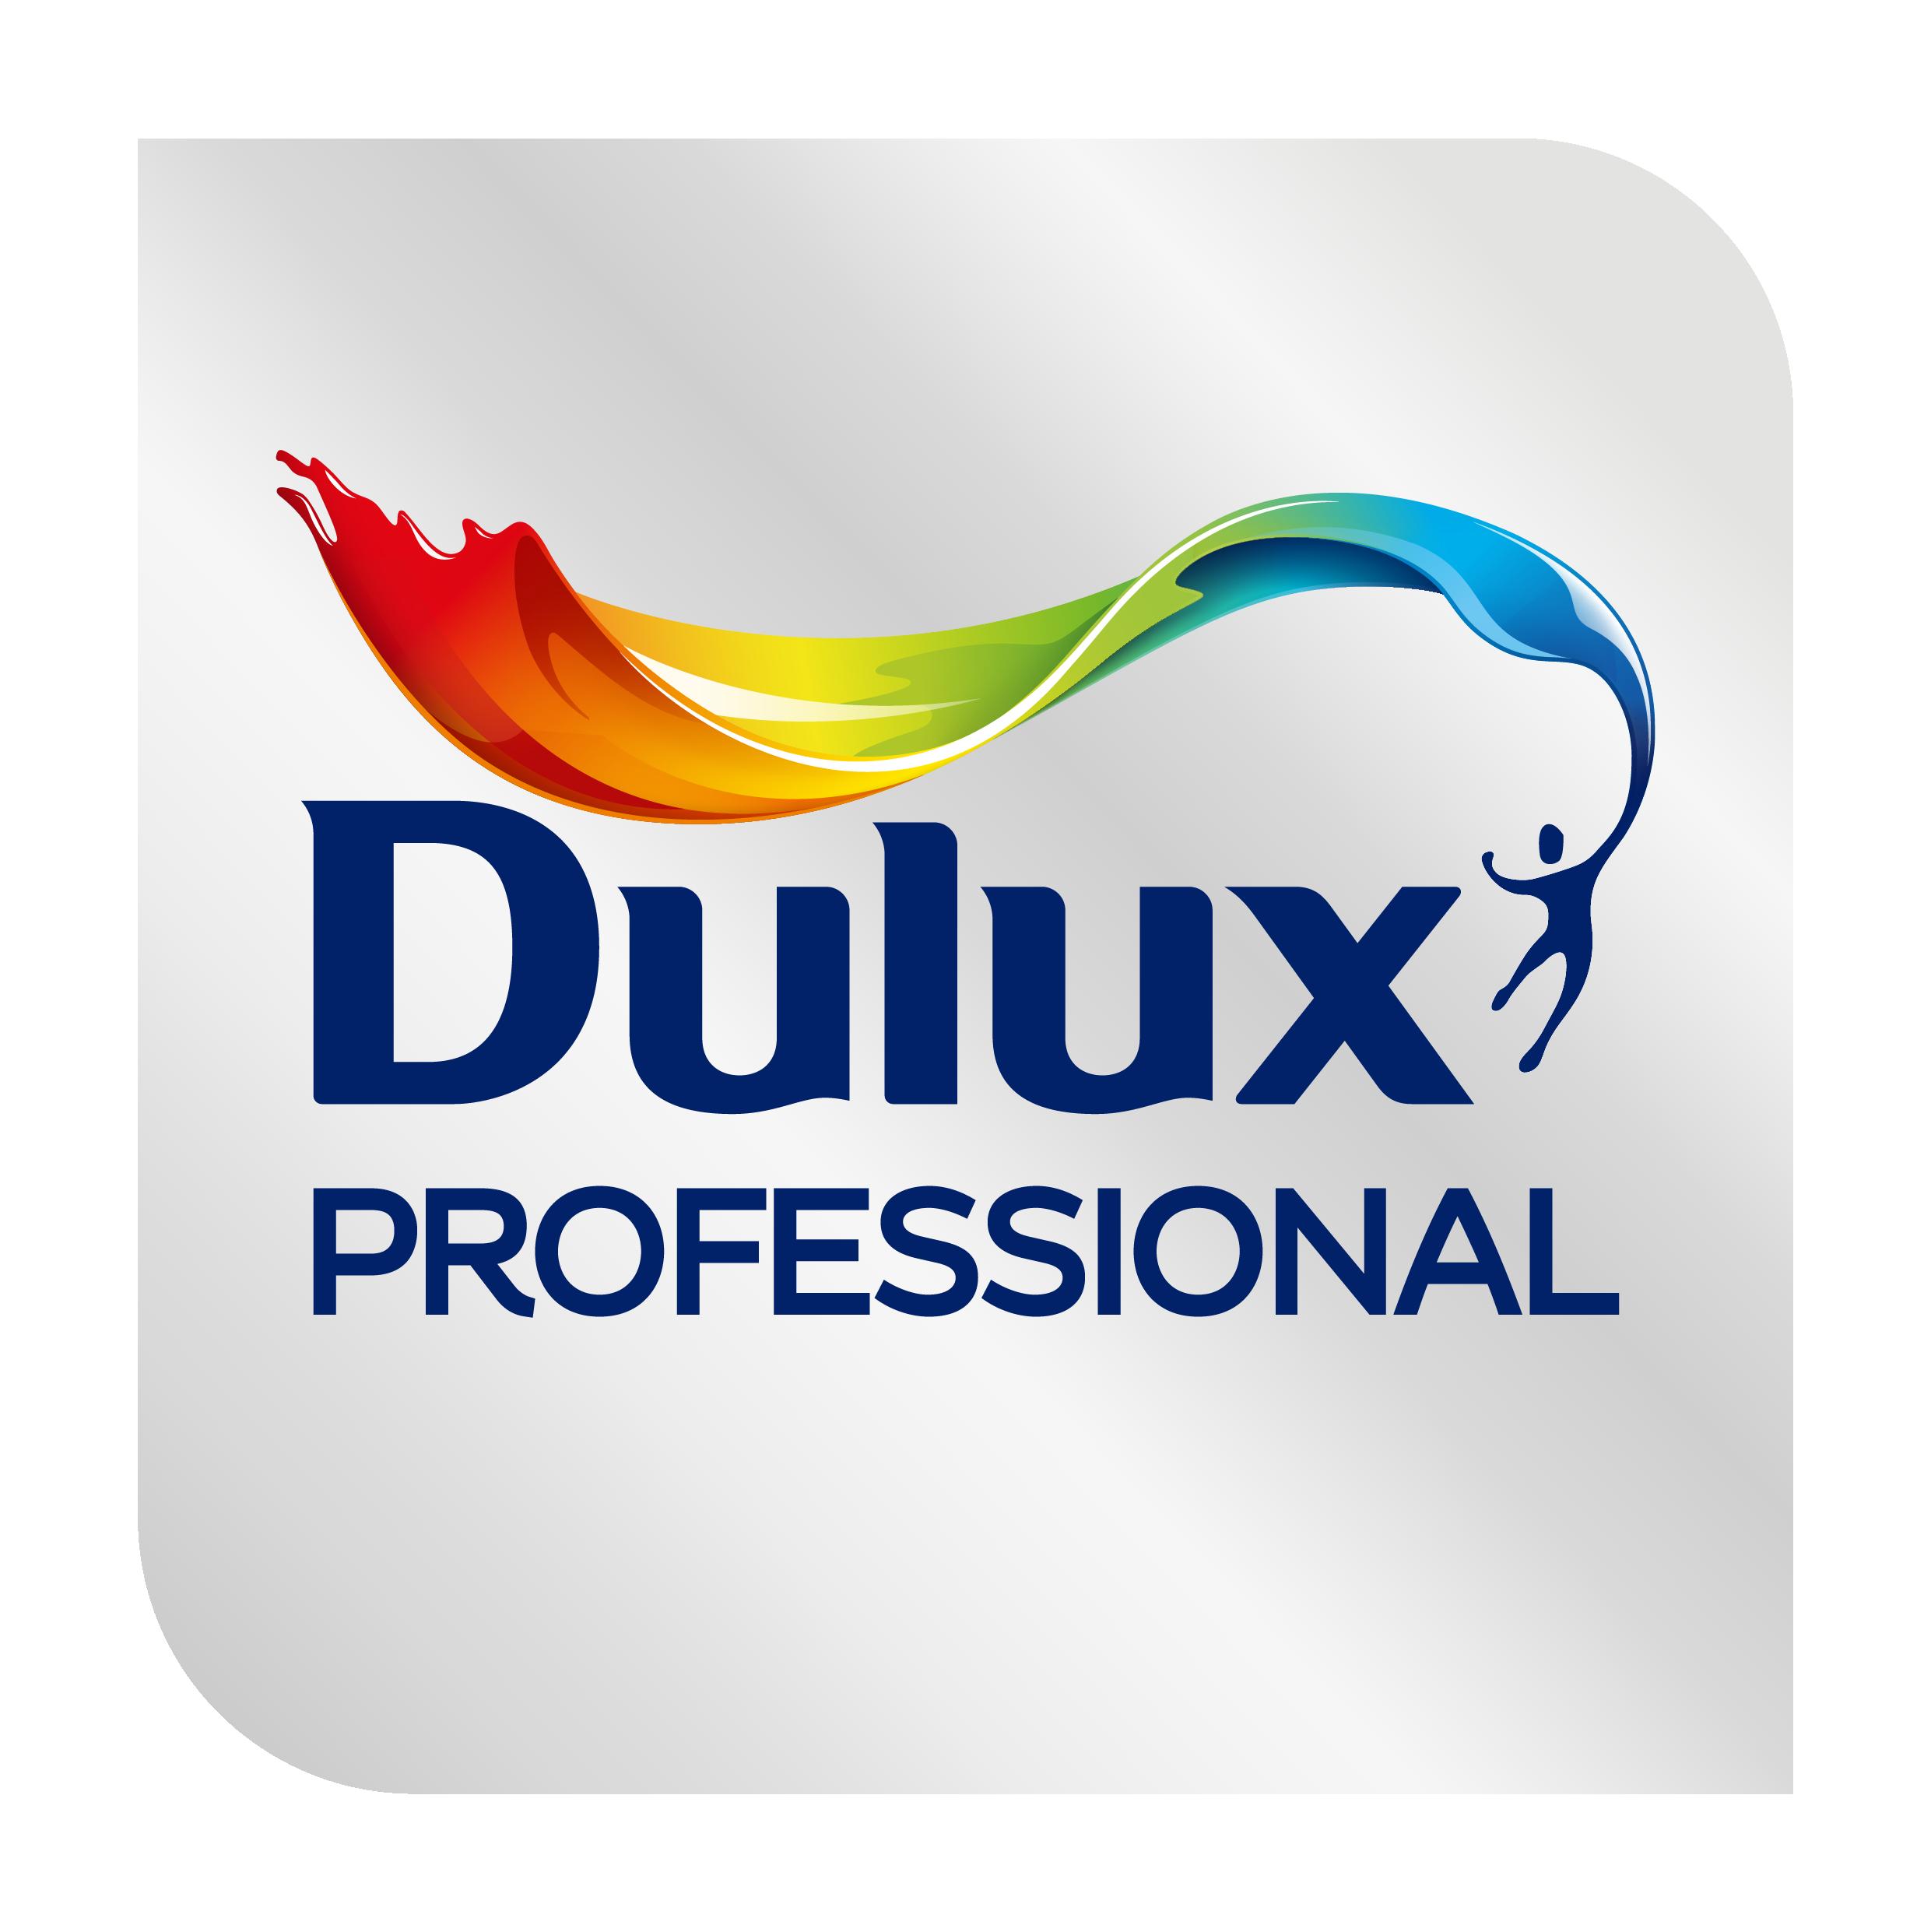 Dulux Professional - logo